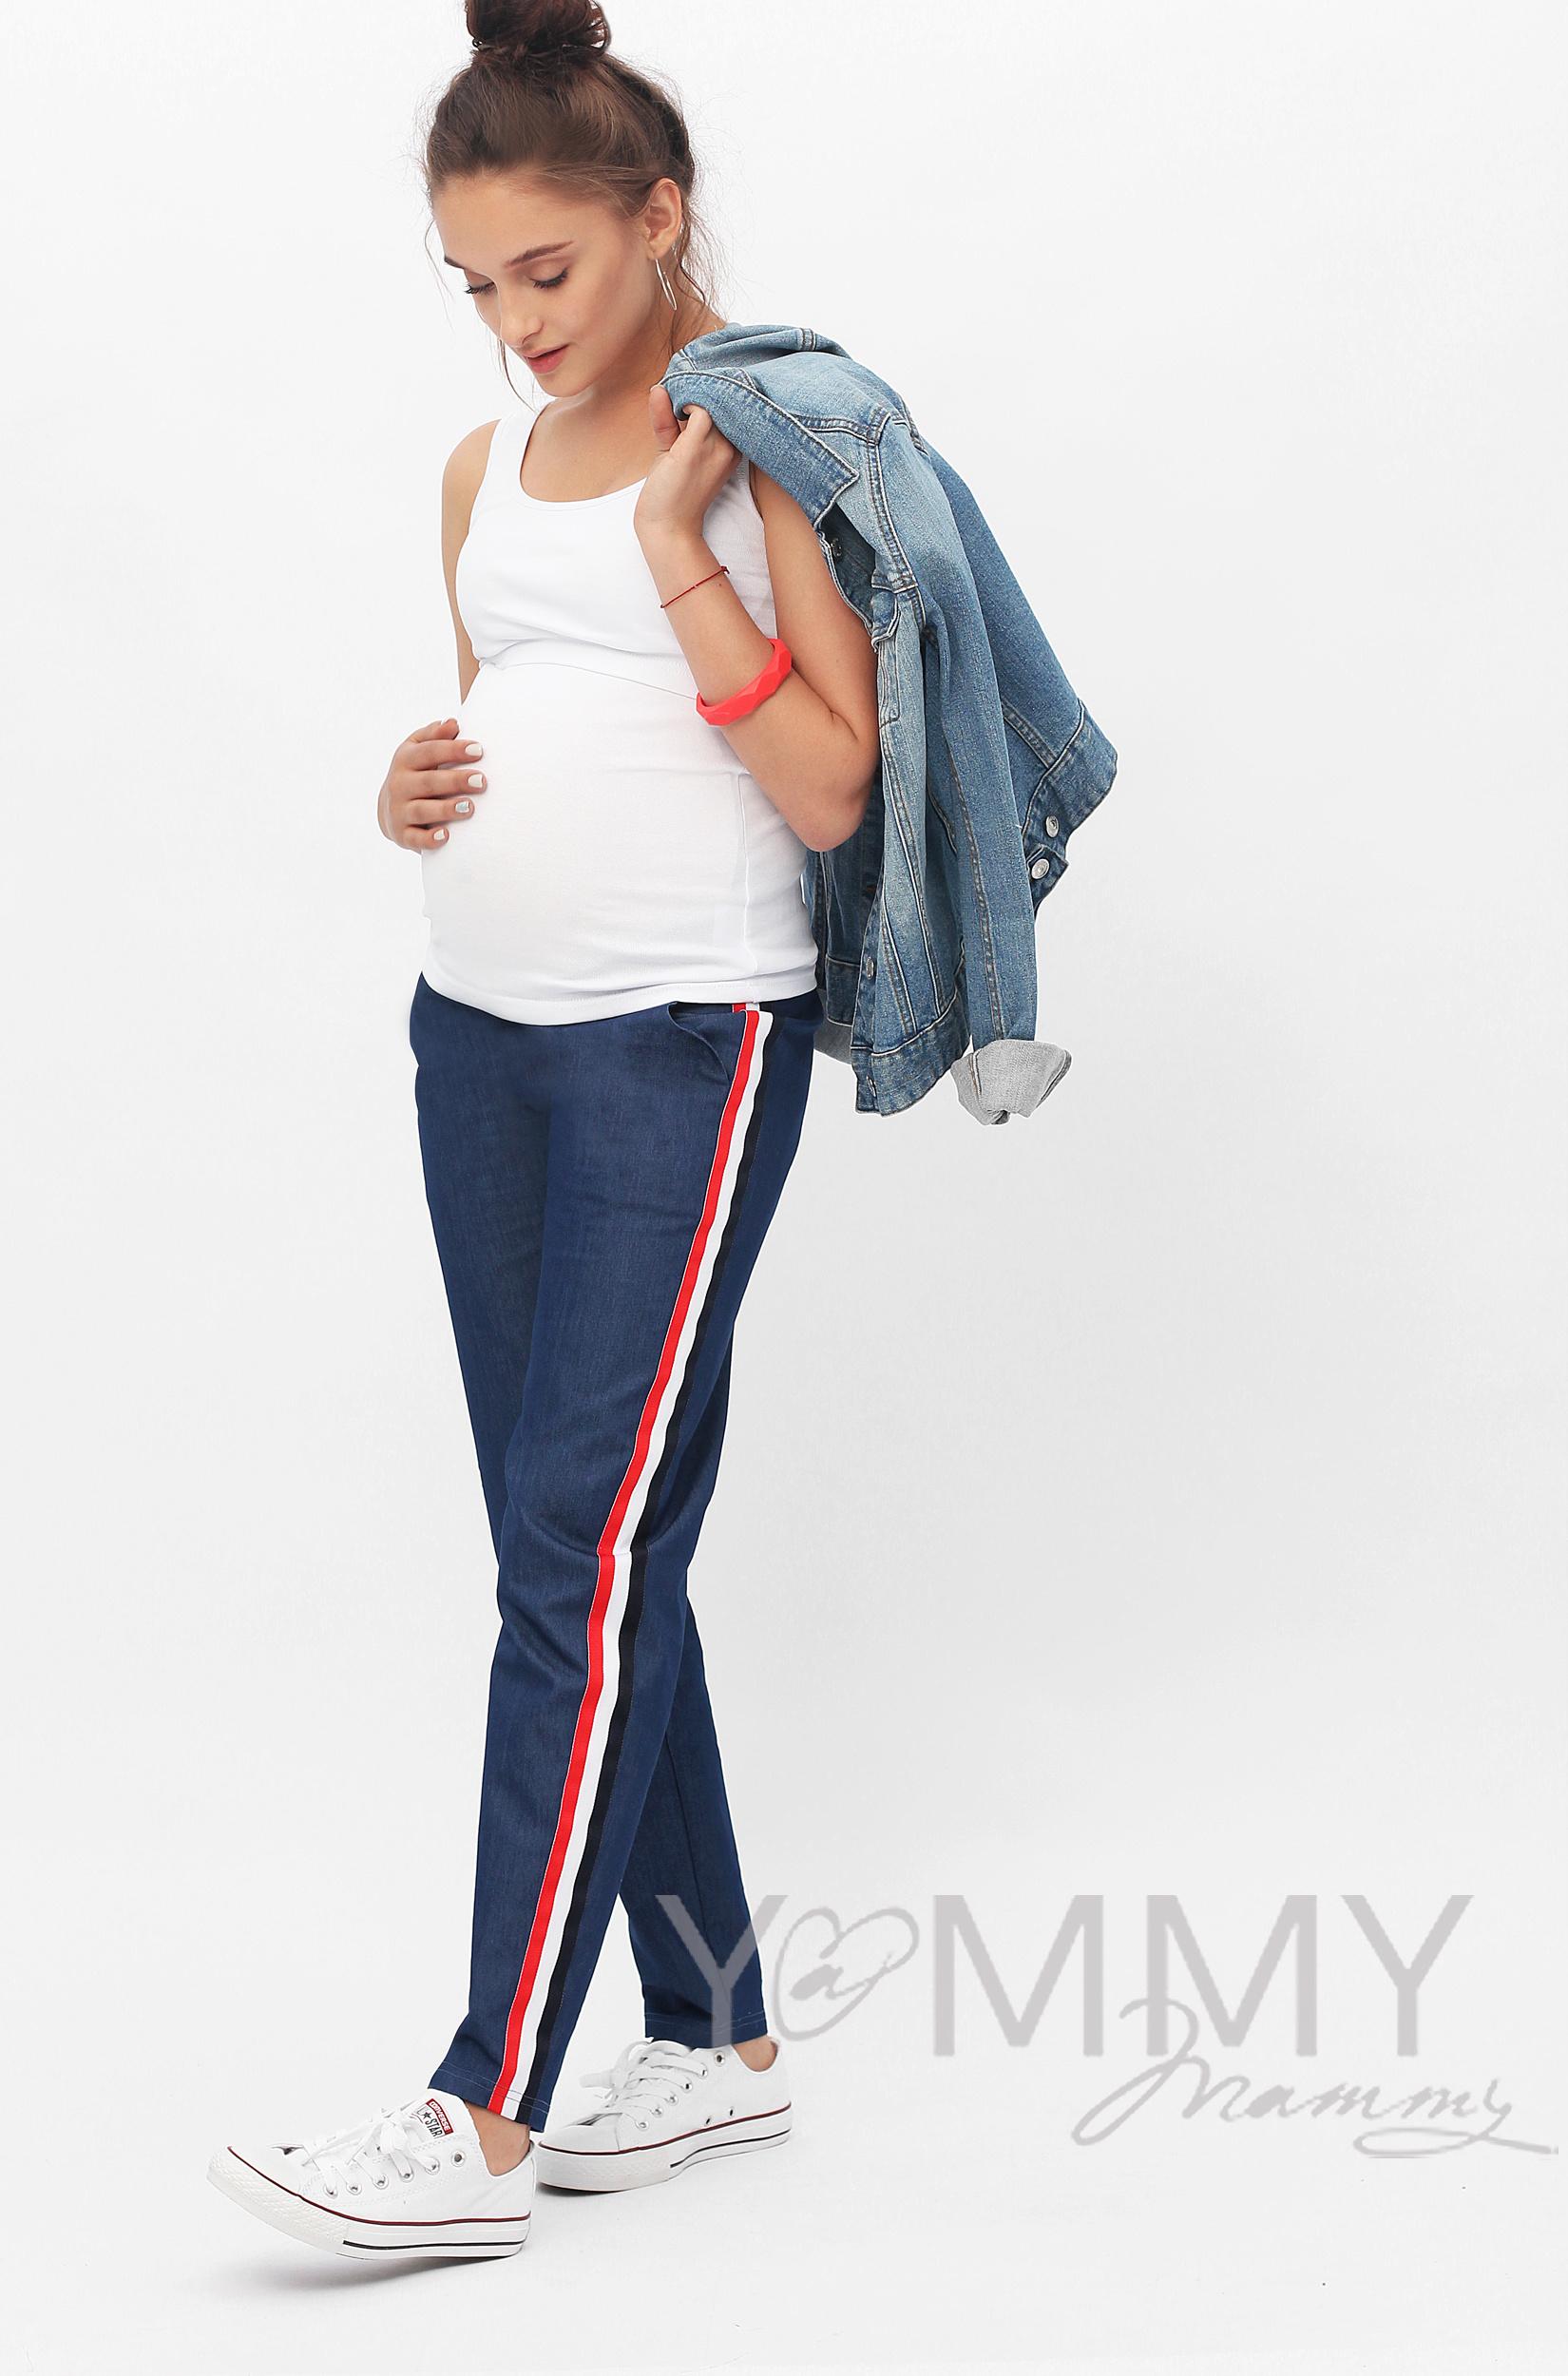 Y@mmy Mammy/scoro/ym_bruki_jeans_univer_lamps12.jpg